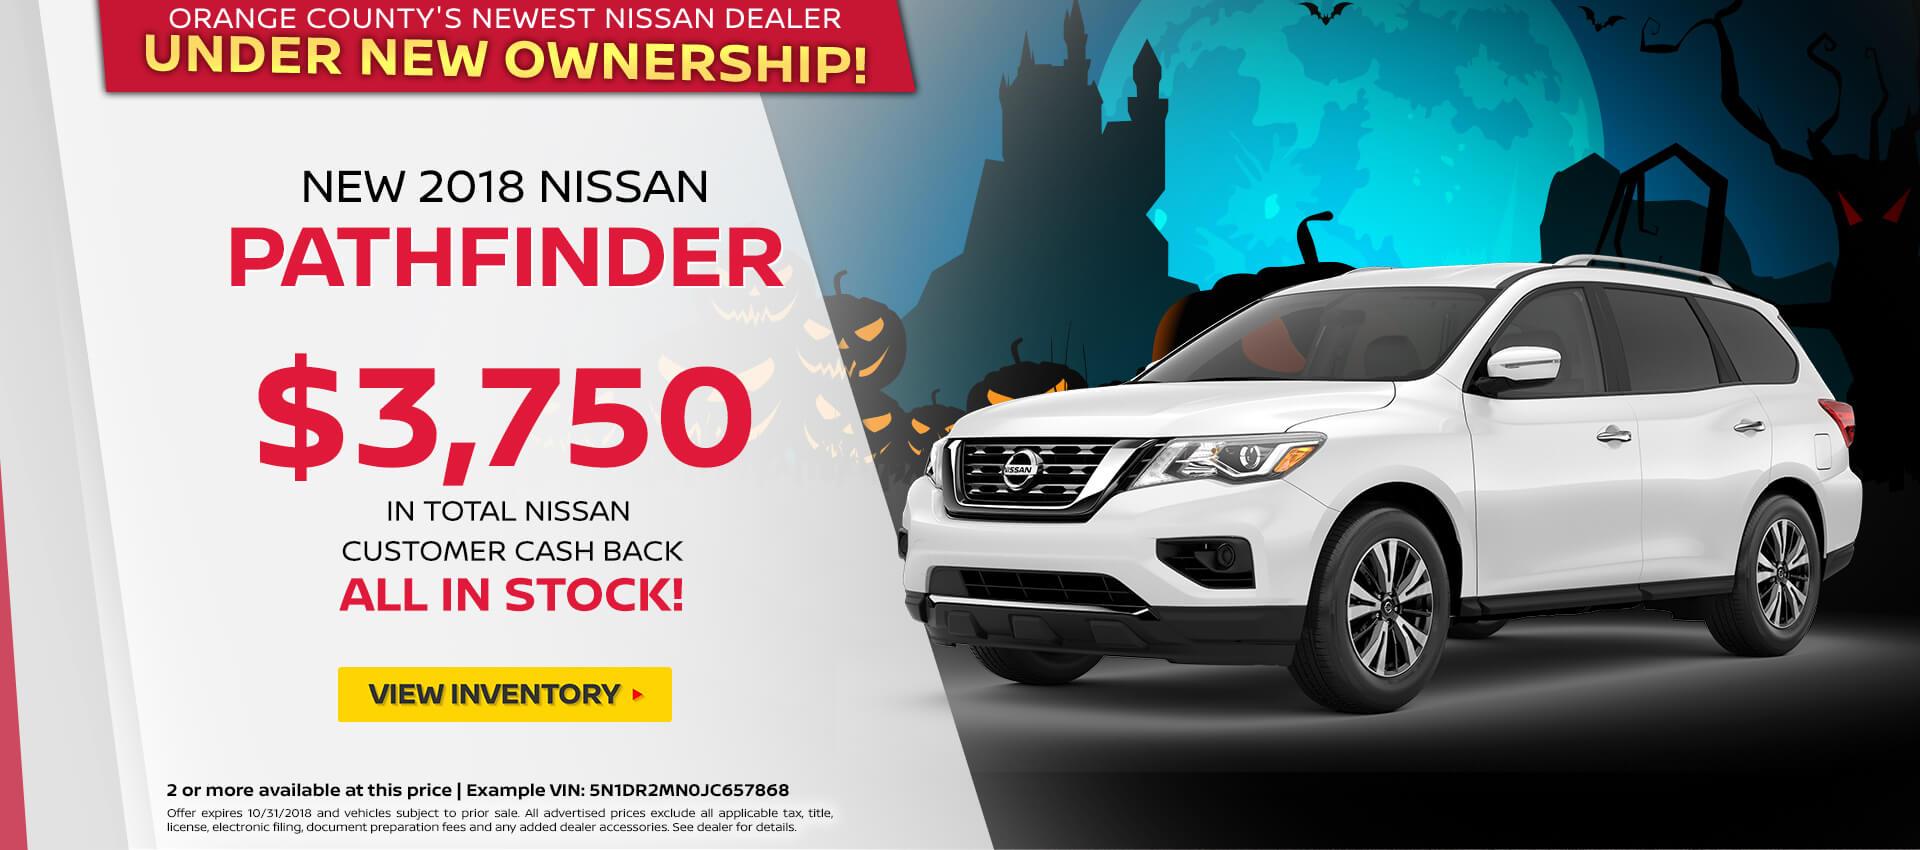 2018 Nissan Pathfinder Special